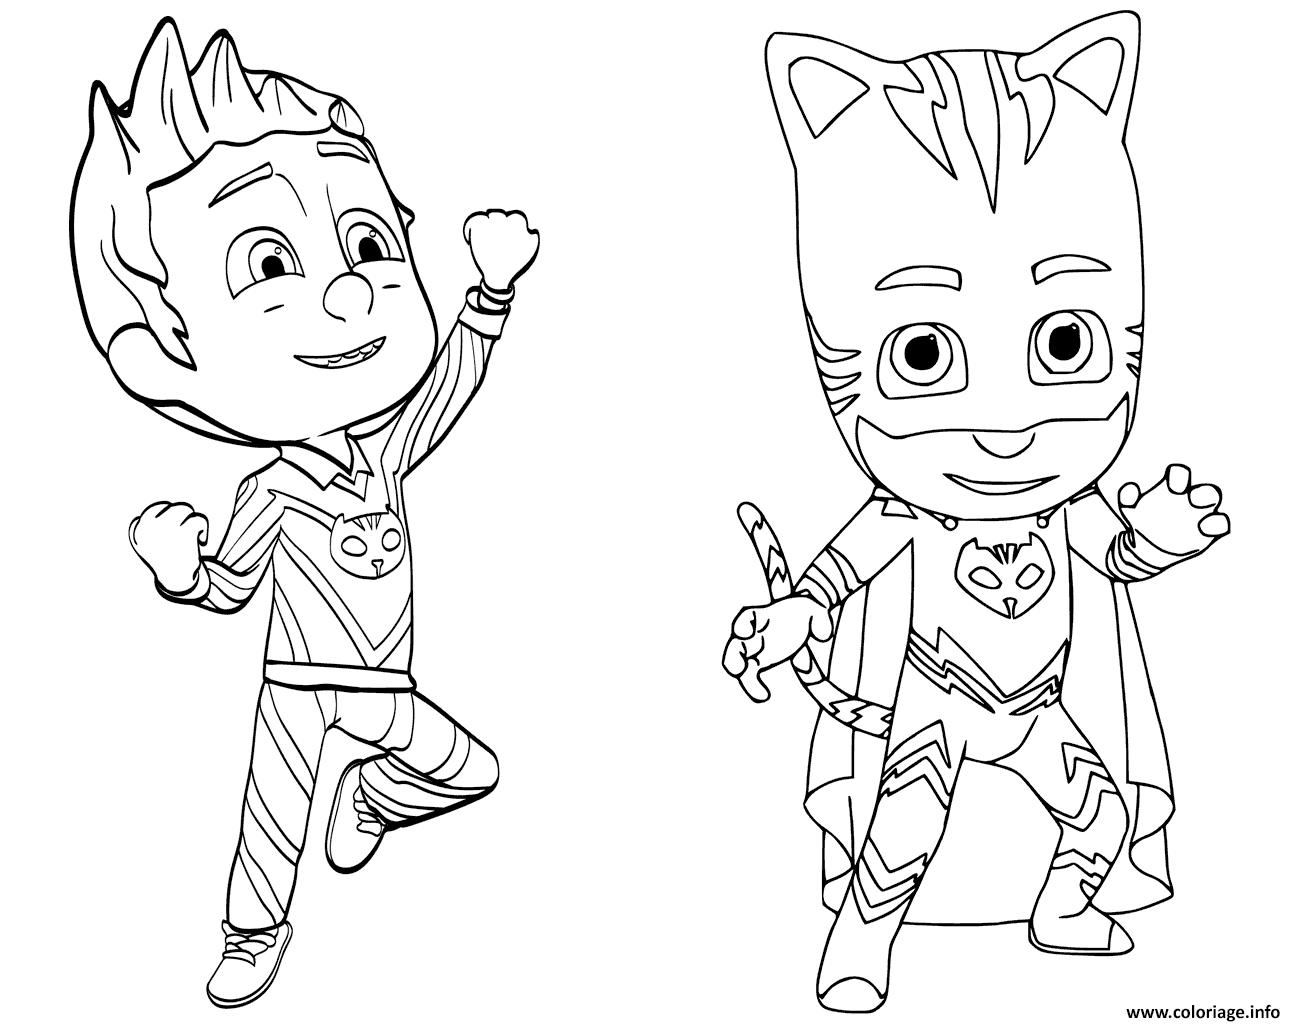 Dessin Pajama Hero Connor is Catboy de Pyjamasques Coloriage Gratuit à Imprimer